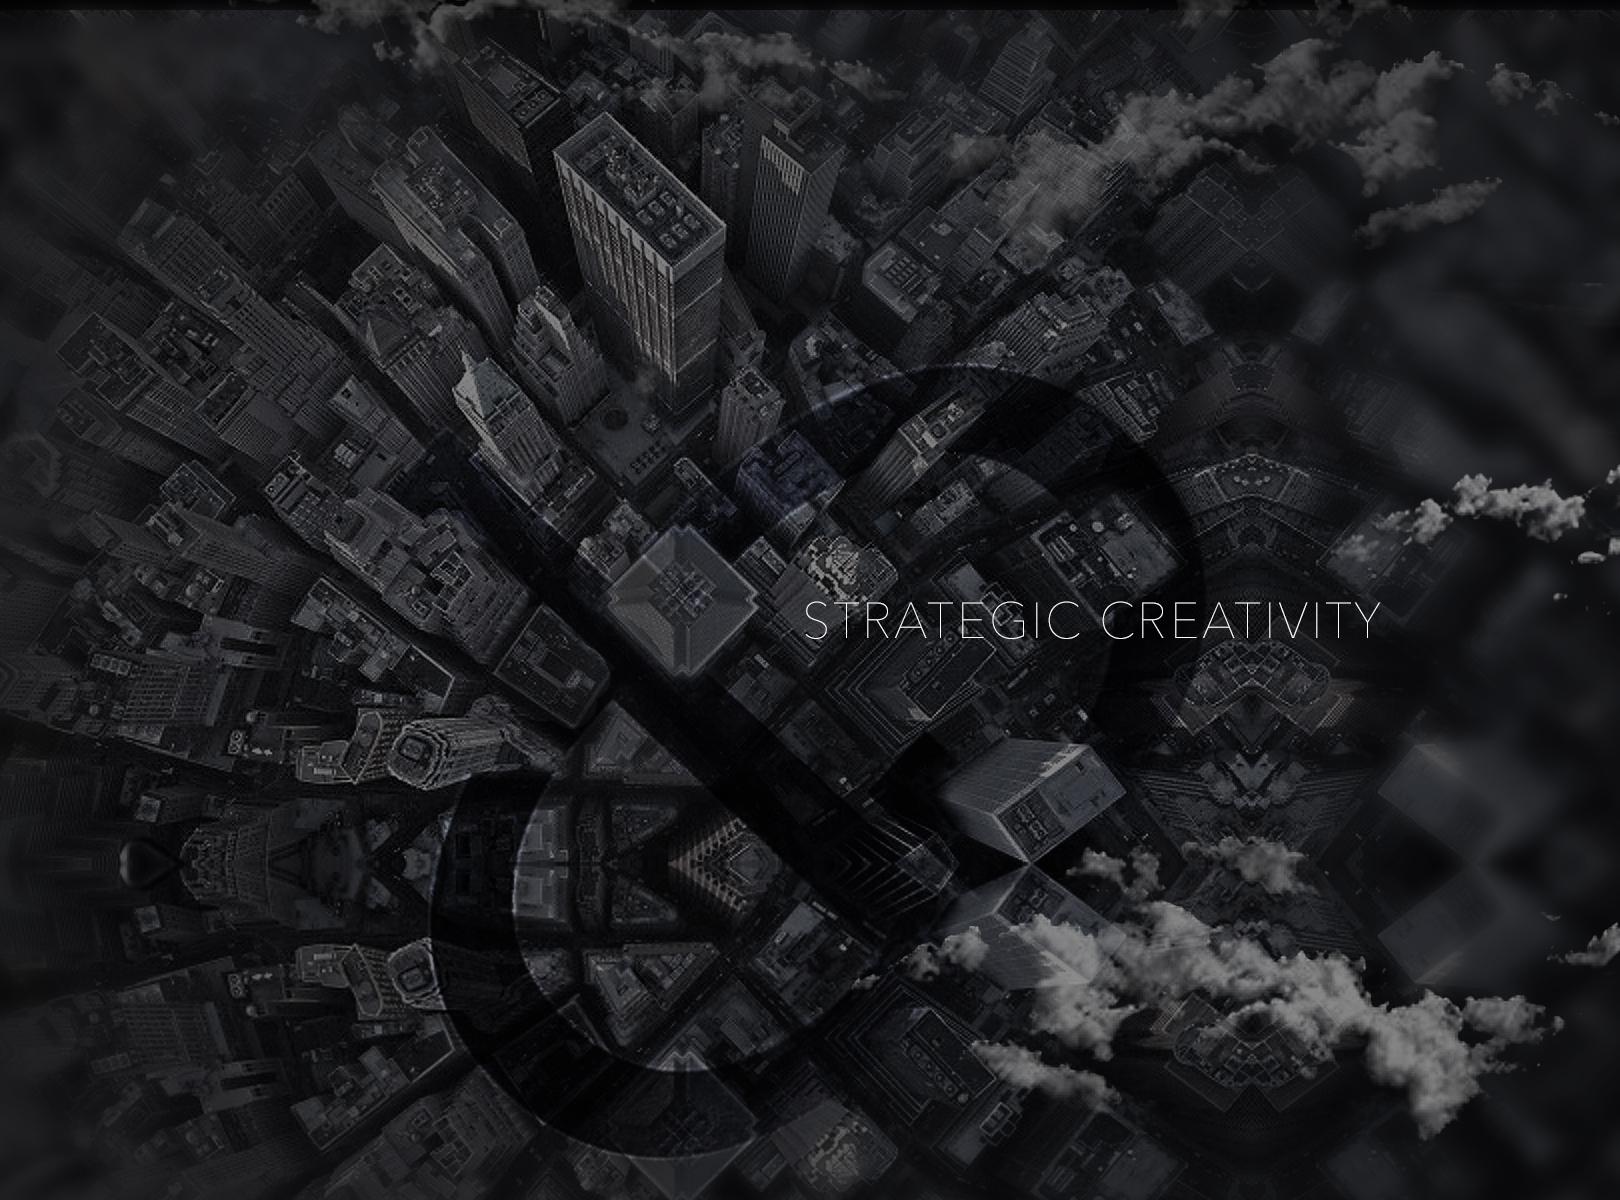 dantedavisdesign-new-background-3